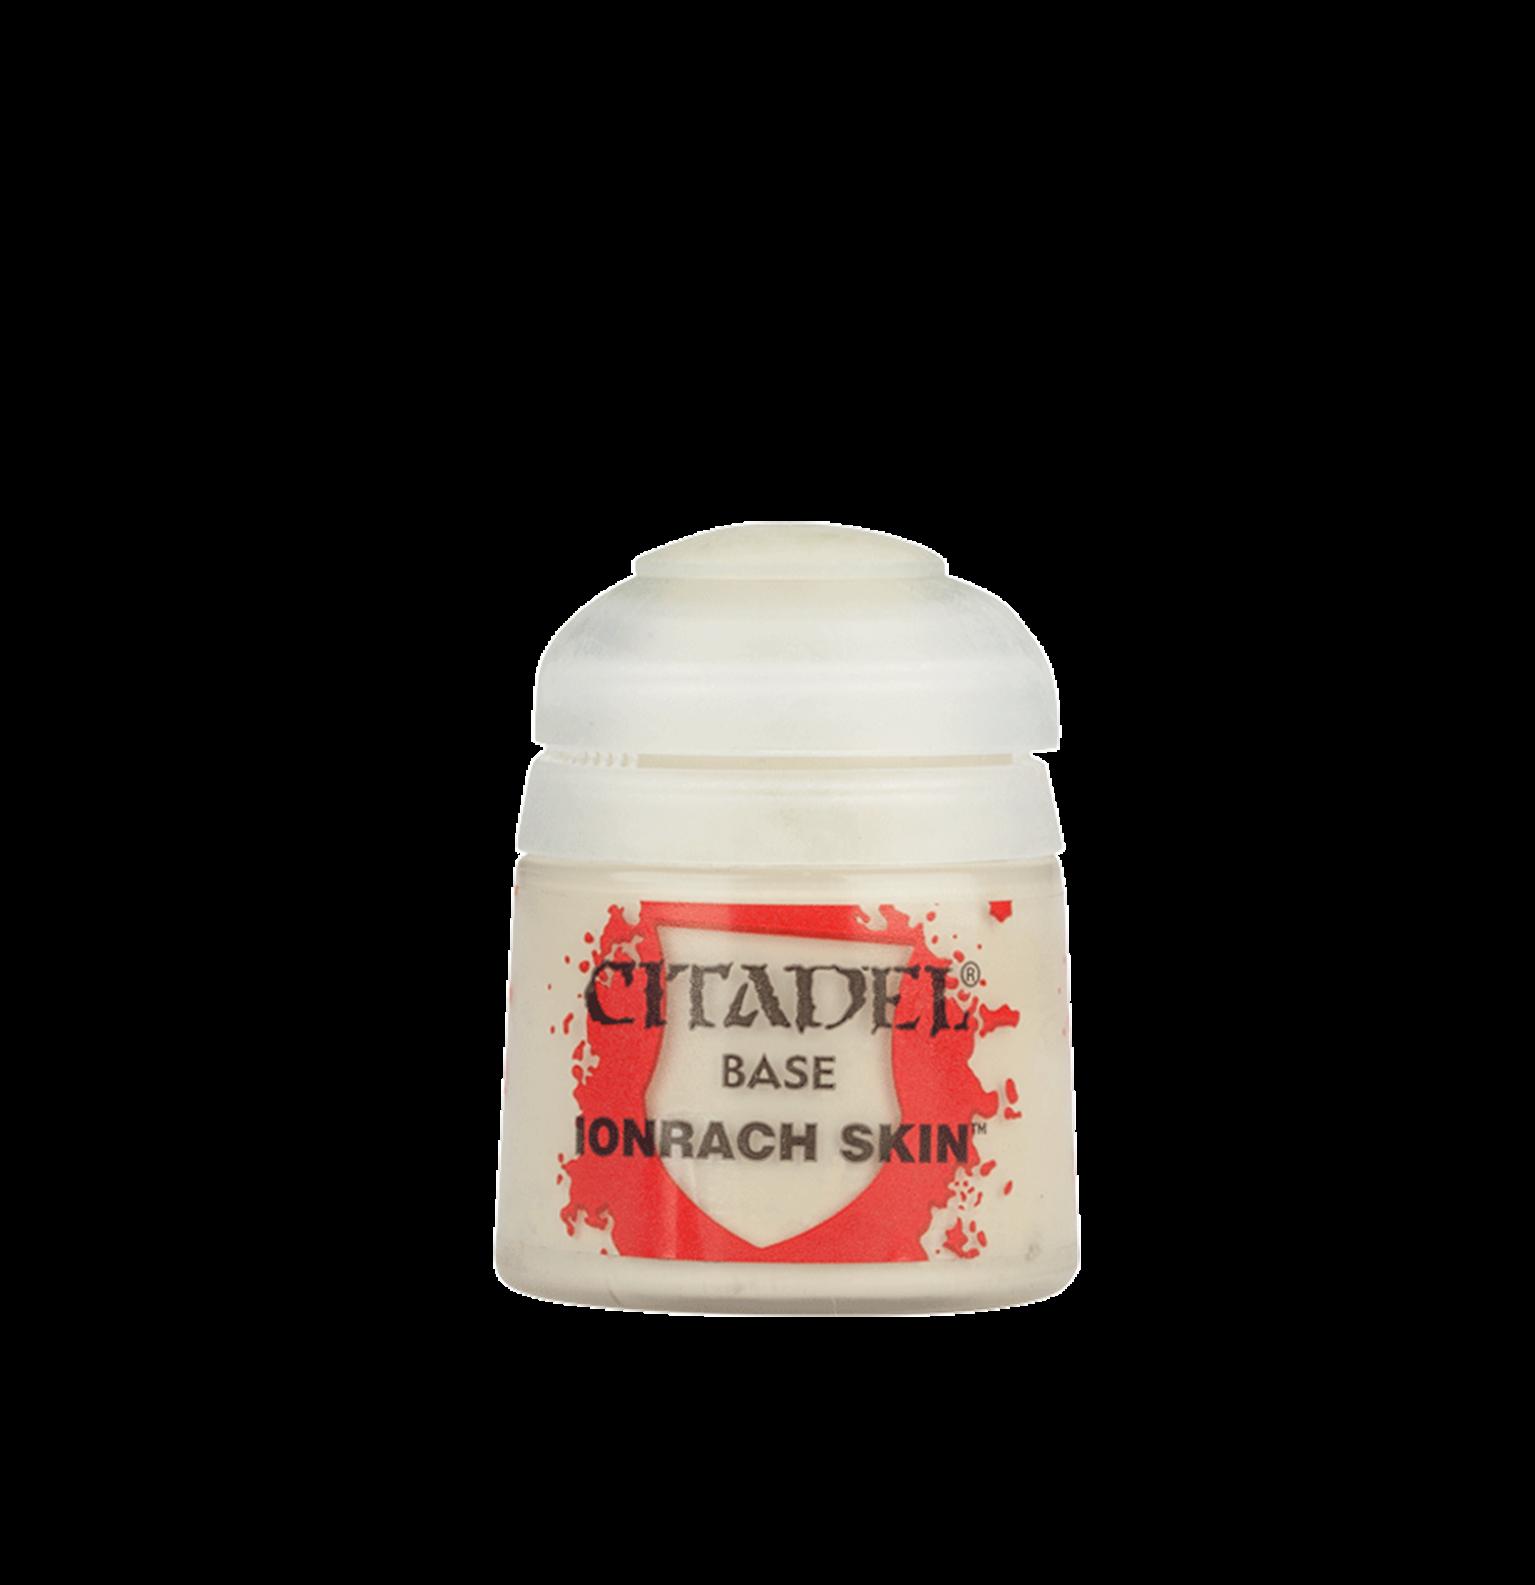 CITADEL BASE Ionrach Skin PAINT POT